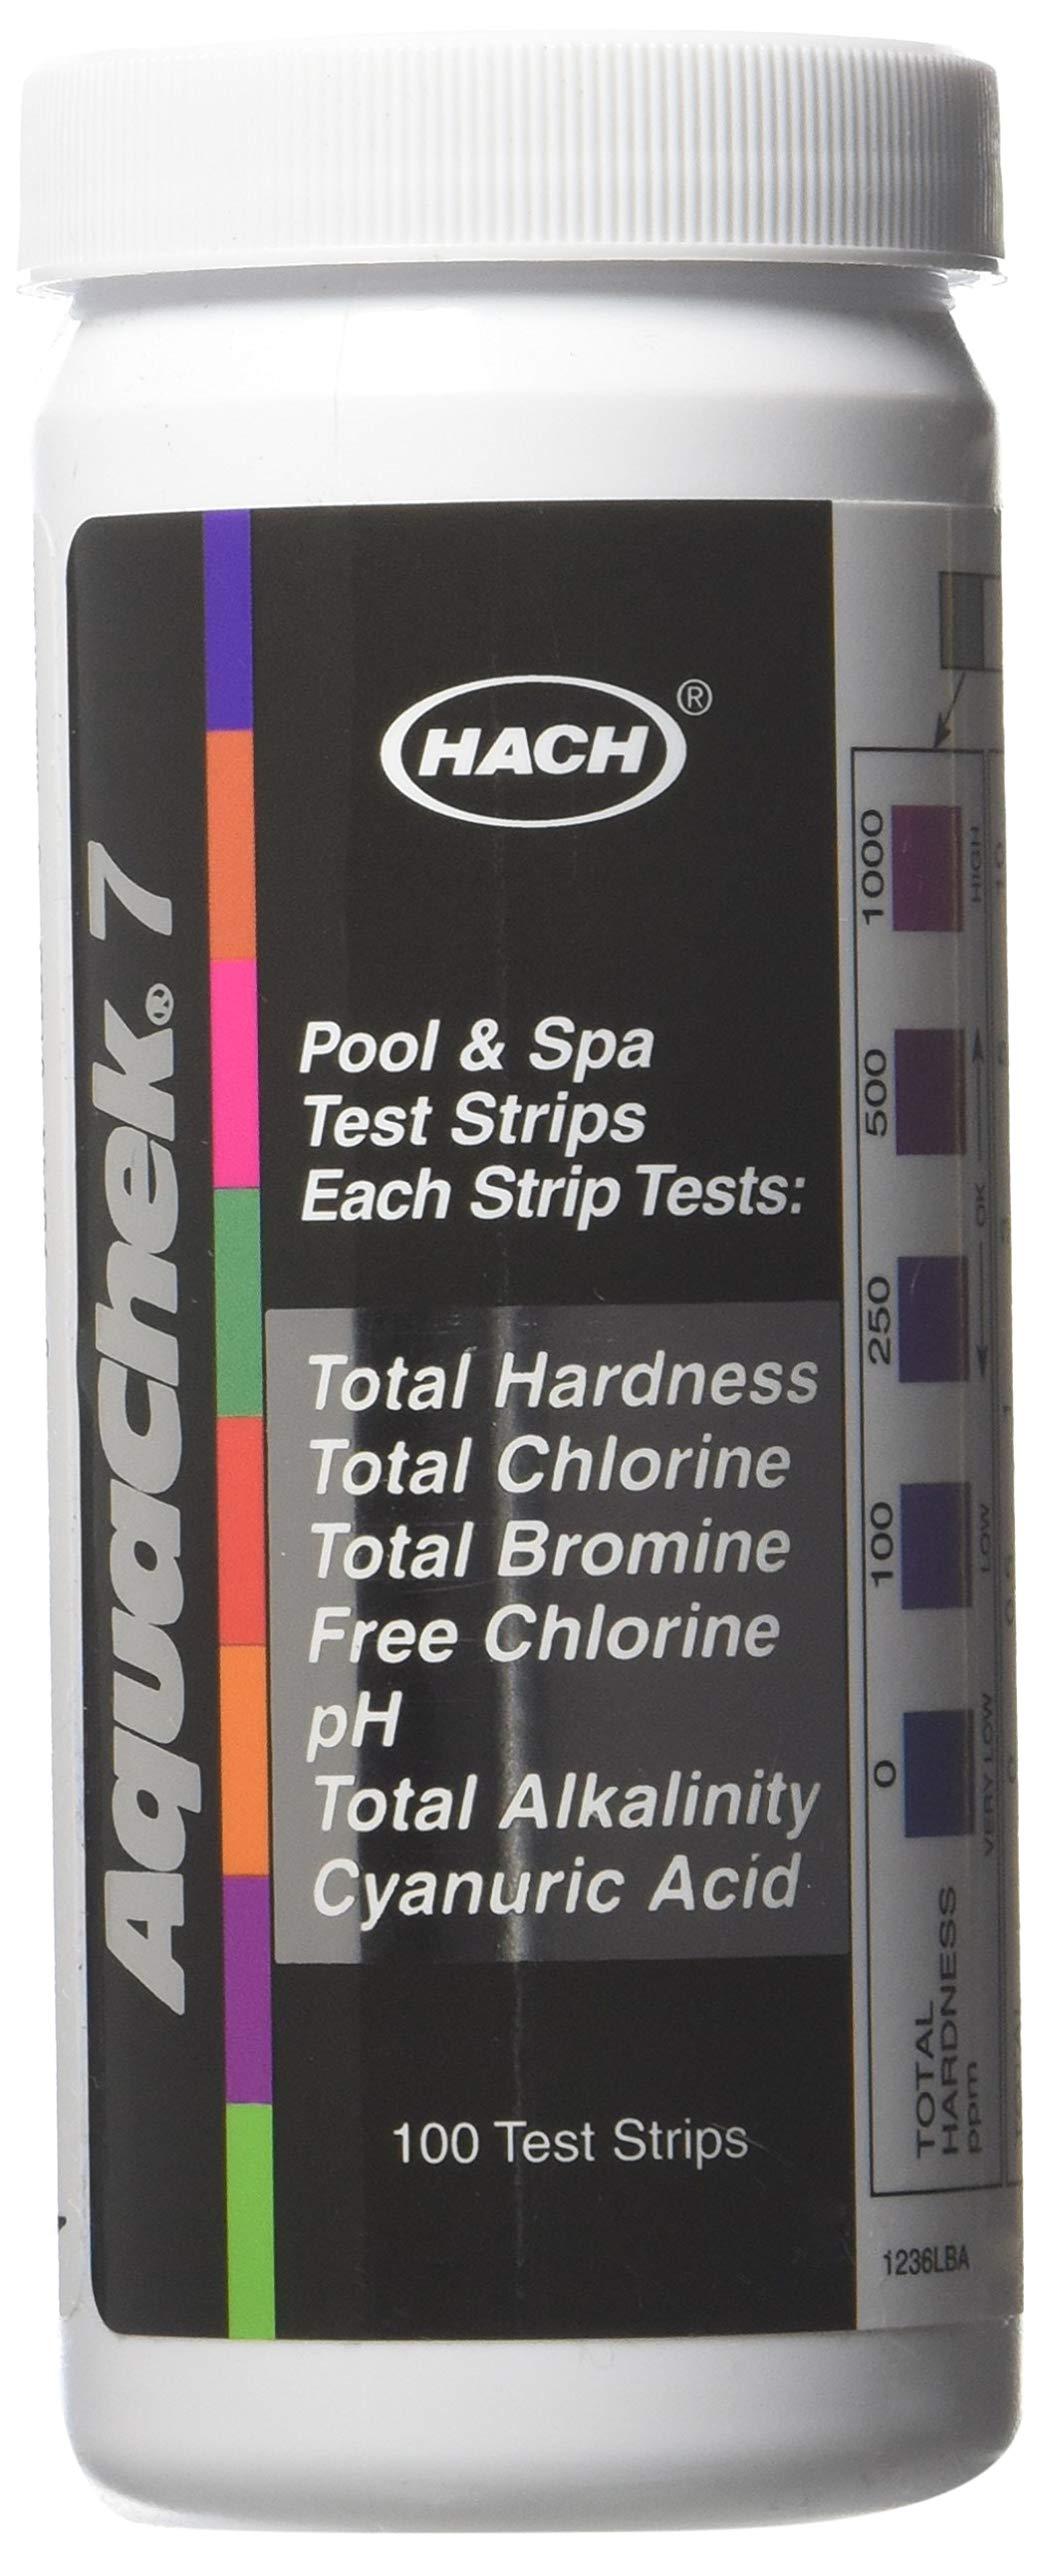 AquaChek 551236 7-Way 100 Count Pool Water Test Strips